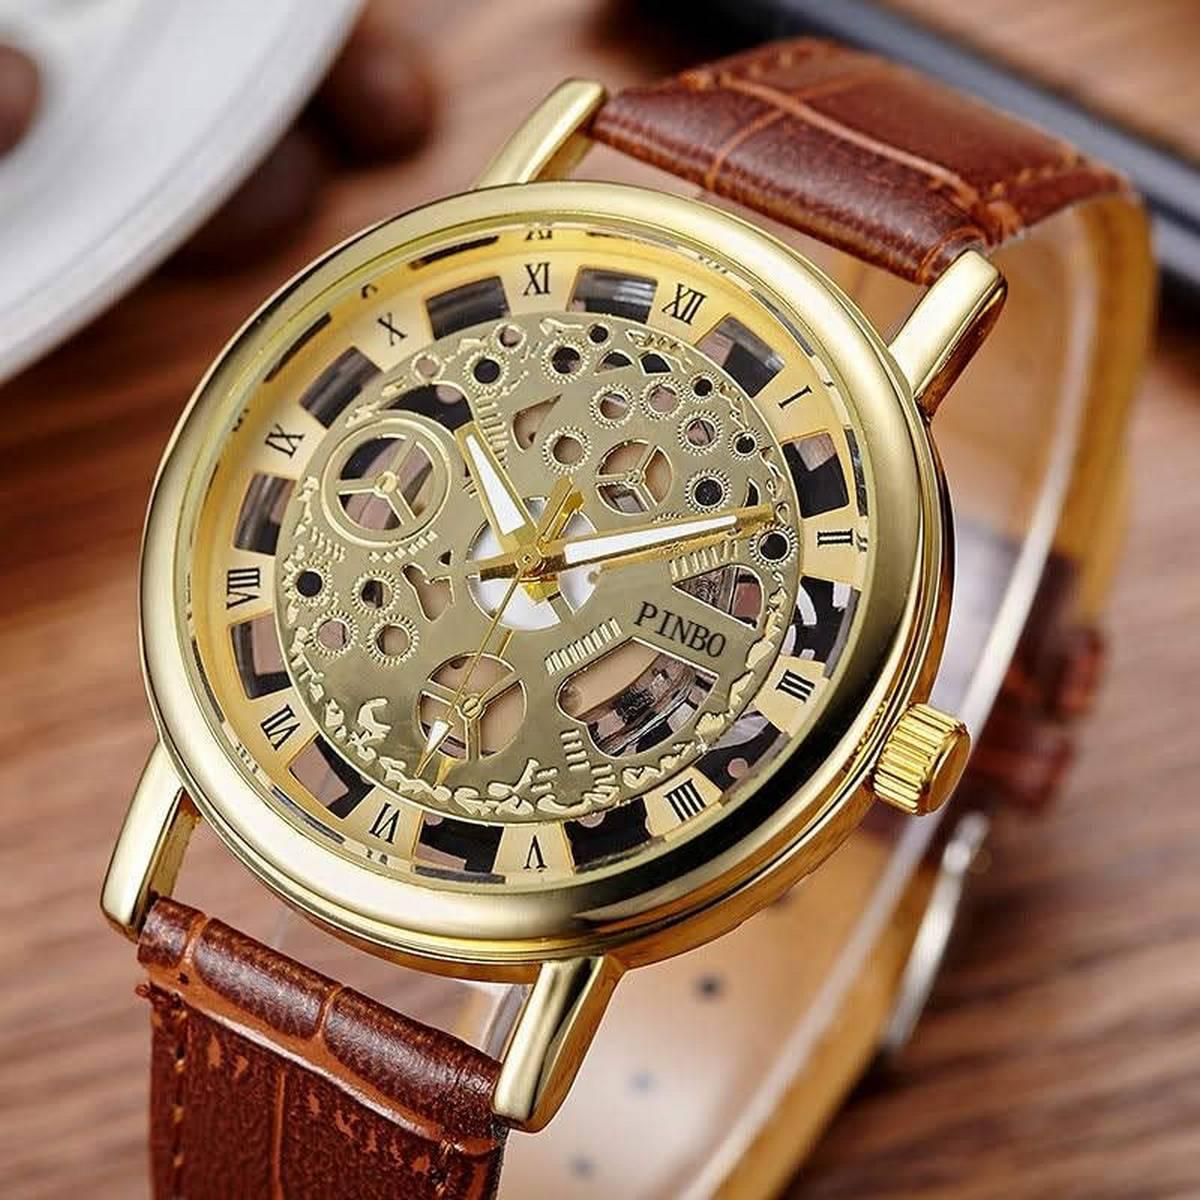 Double Sided Glass Golden  Watch for Men / Women / Girls / Boys